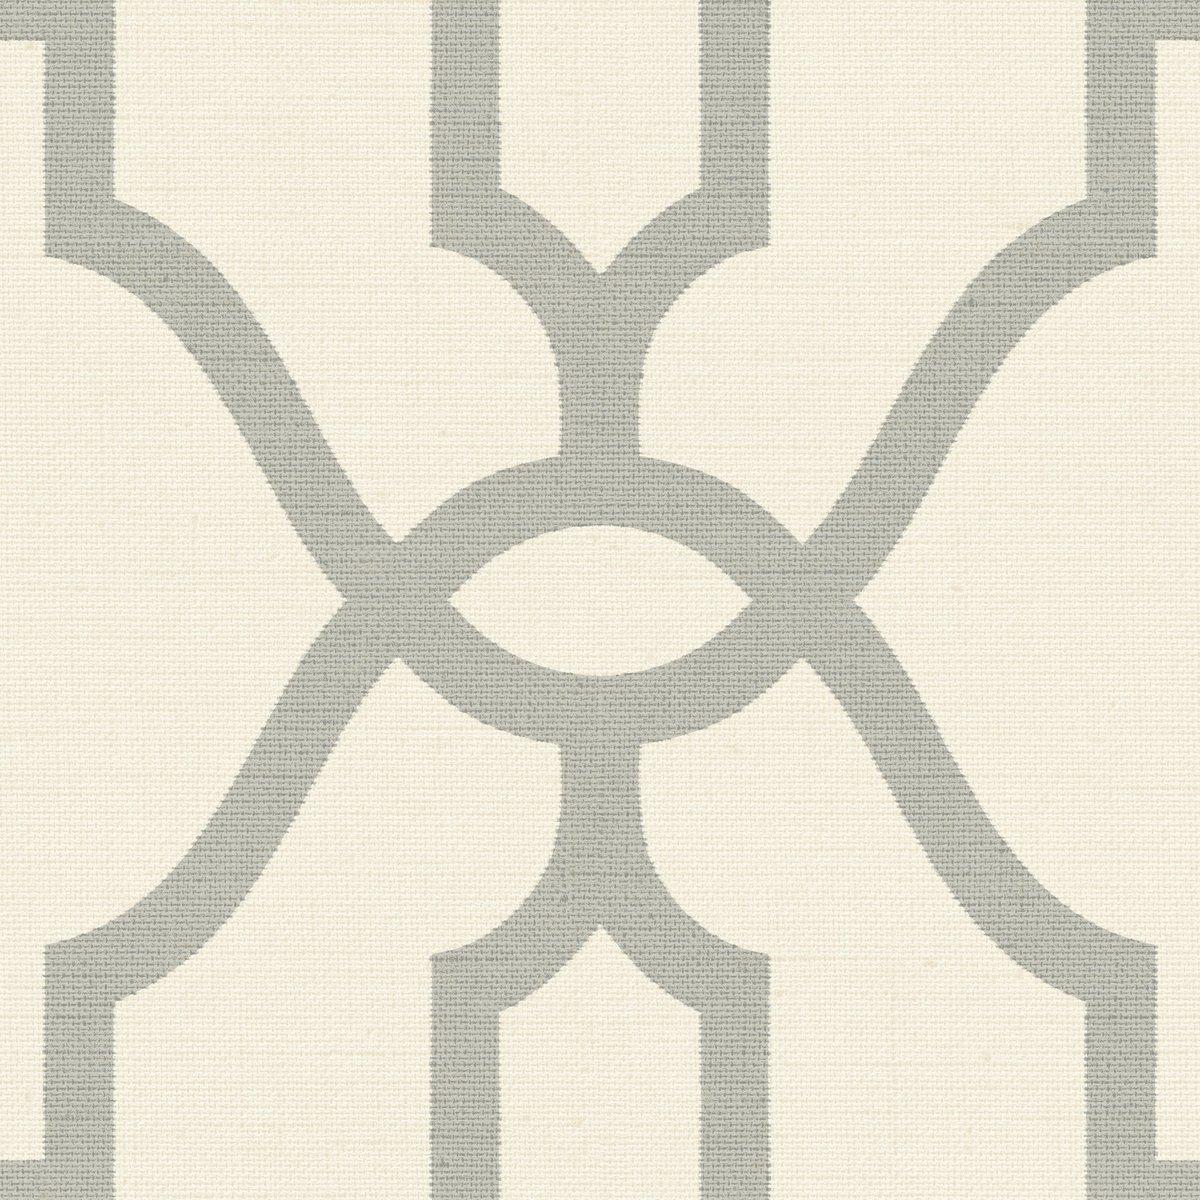 York Wallcoverings ME1555 Magnolia Home Vol. II Woven Trellis Quarry Grey on Cream